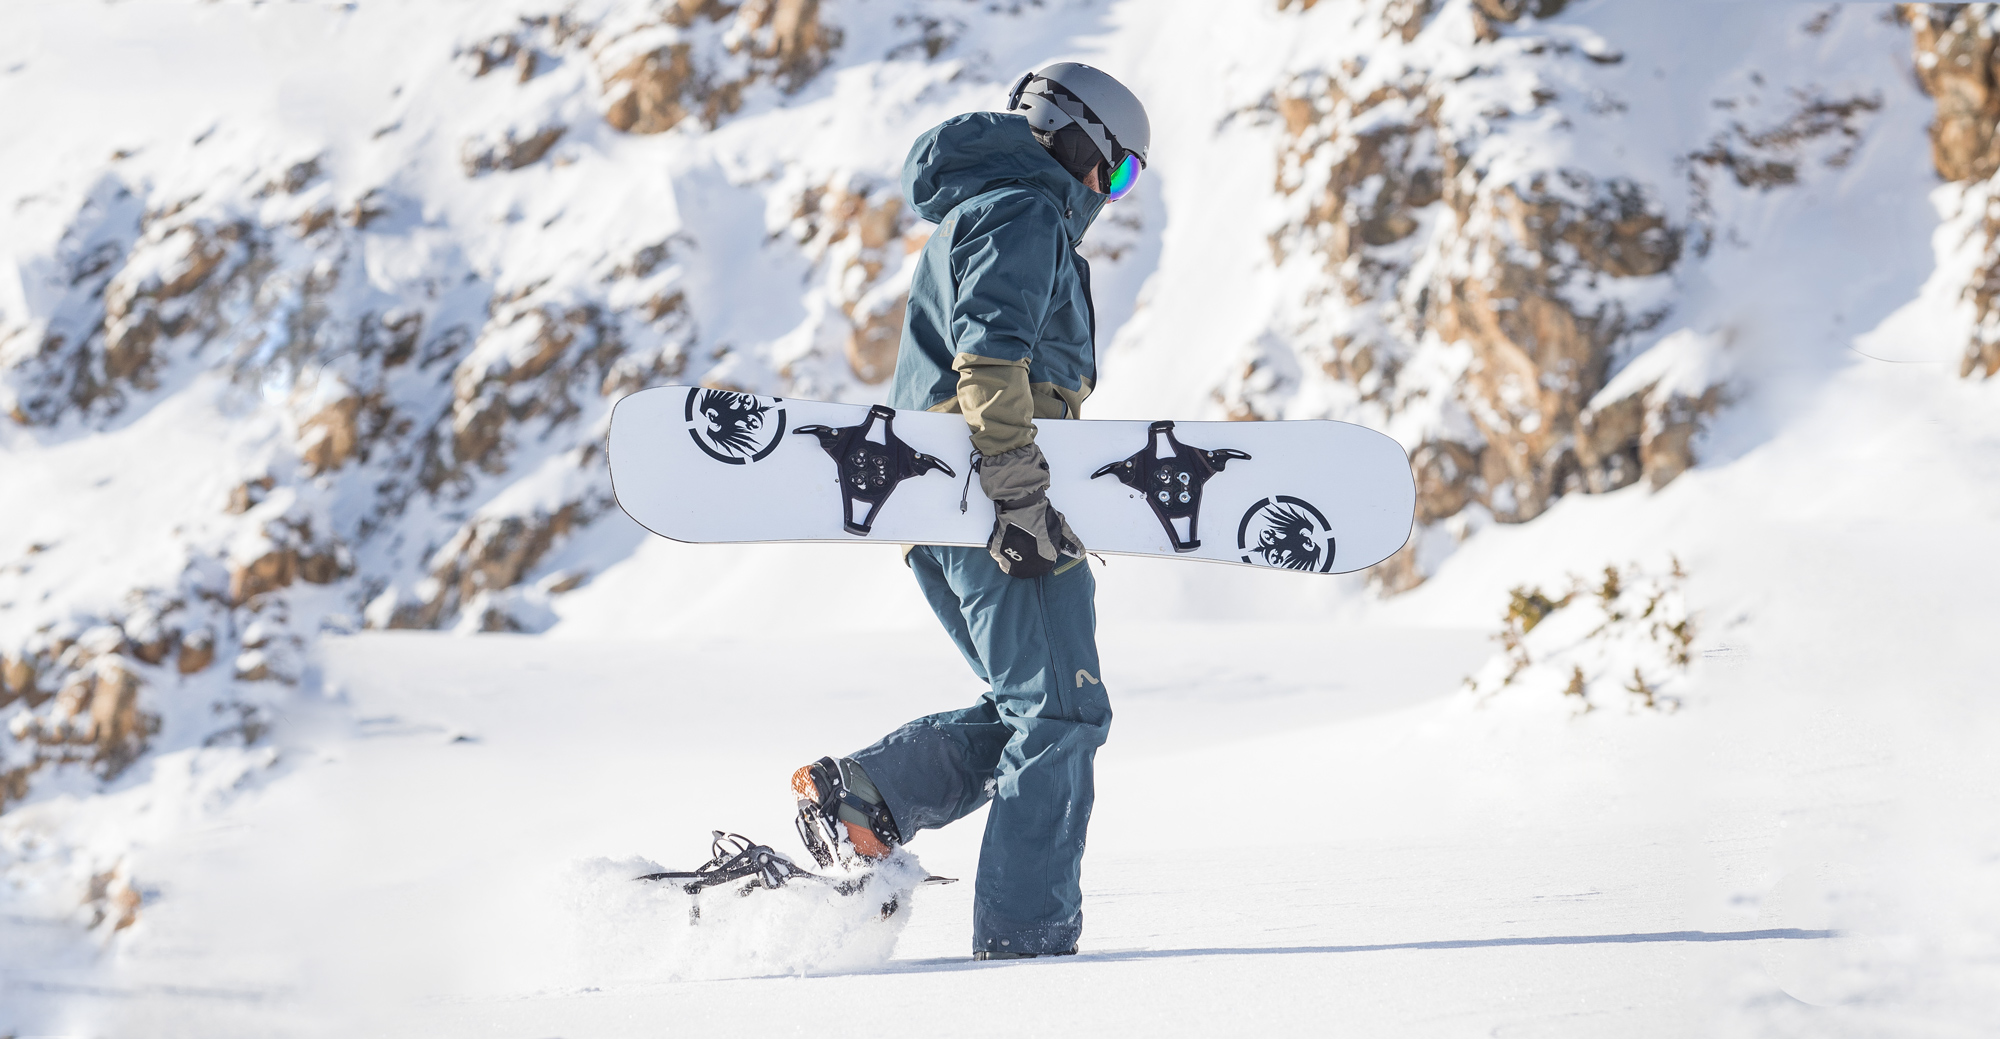 convert snowboard bindings